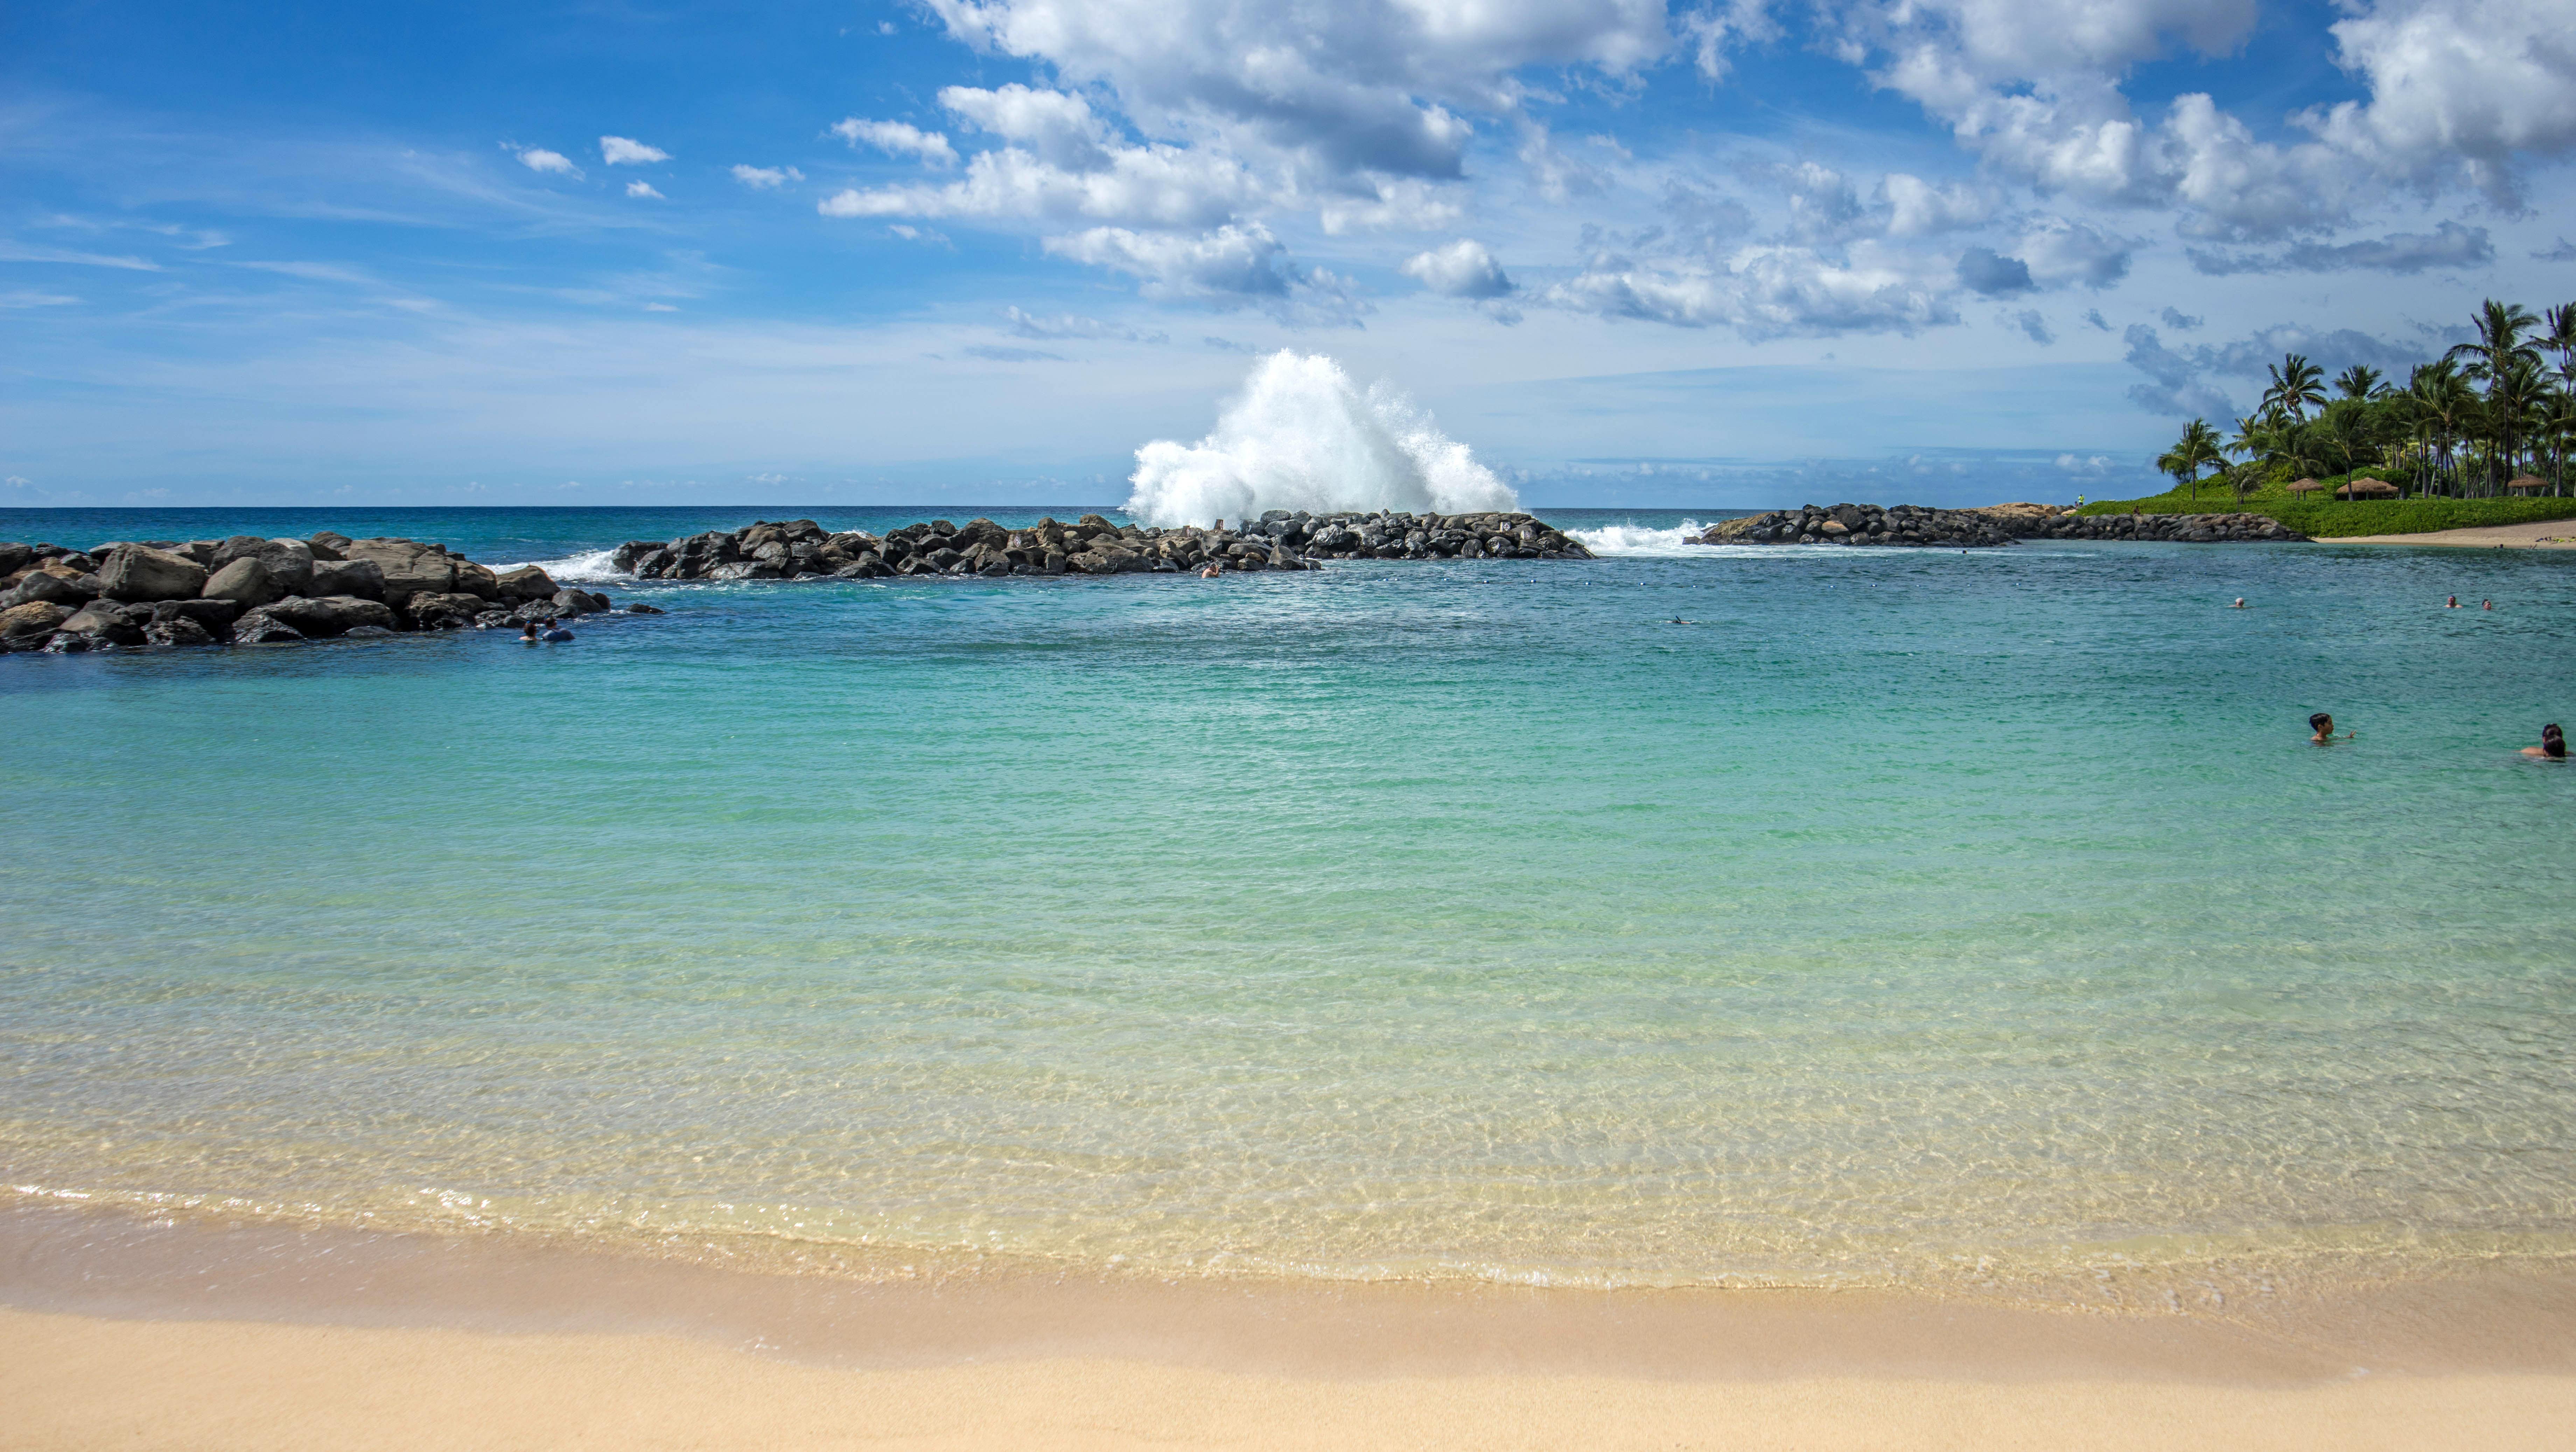 Beautiful Ocean Landscape In Ko Olina Hawaii Image Free